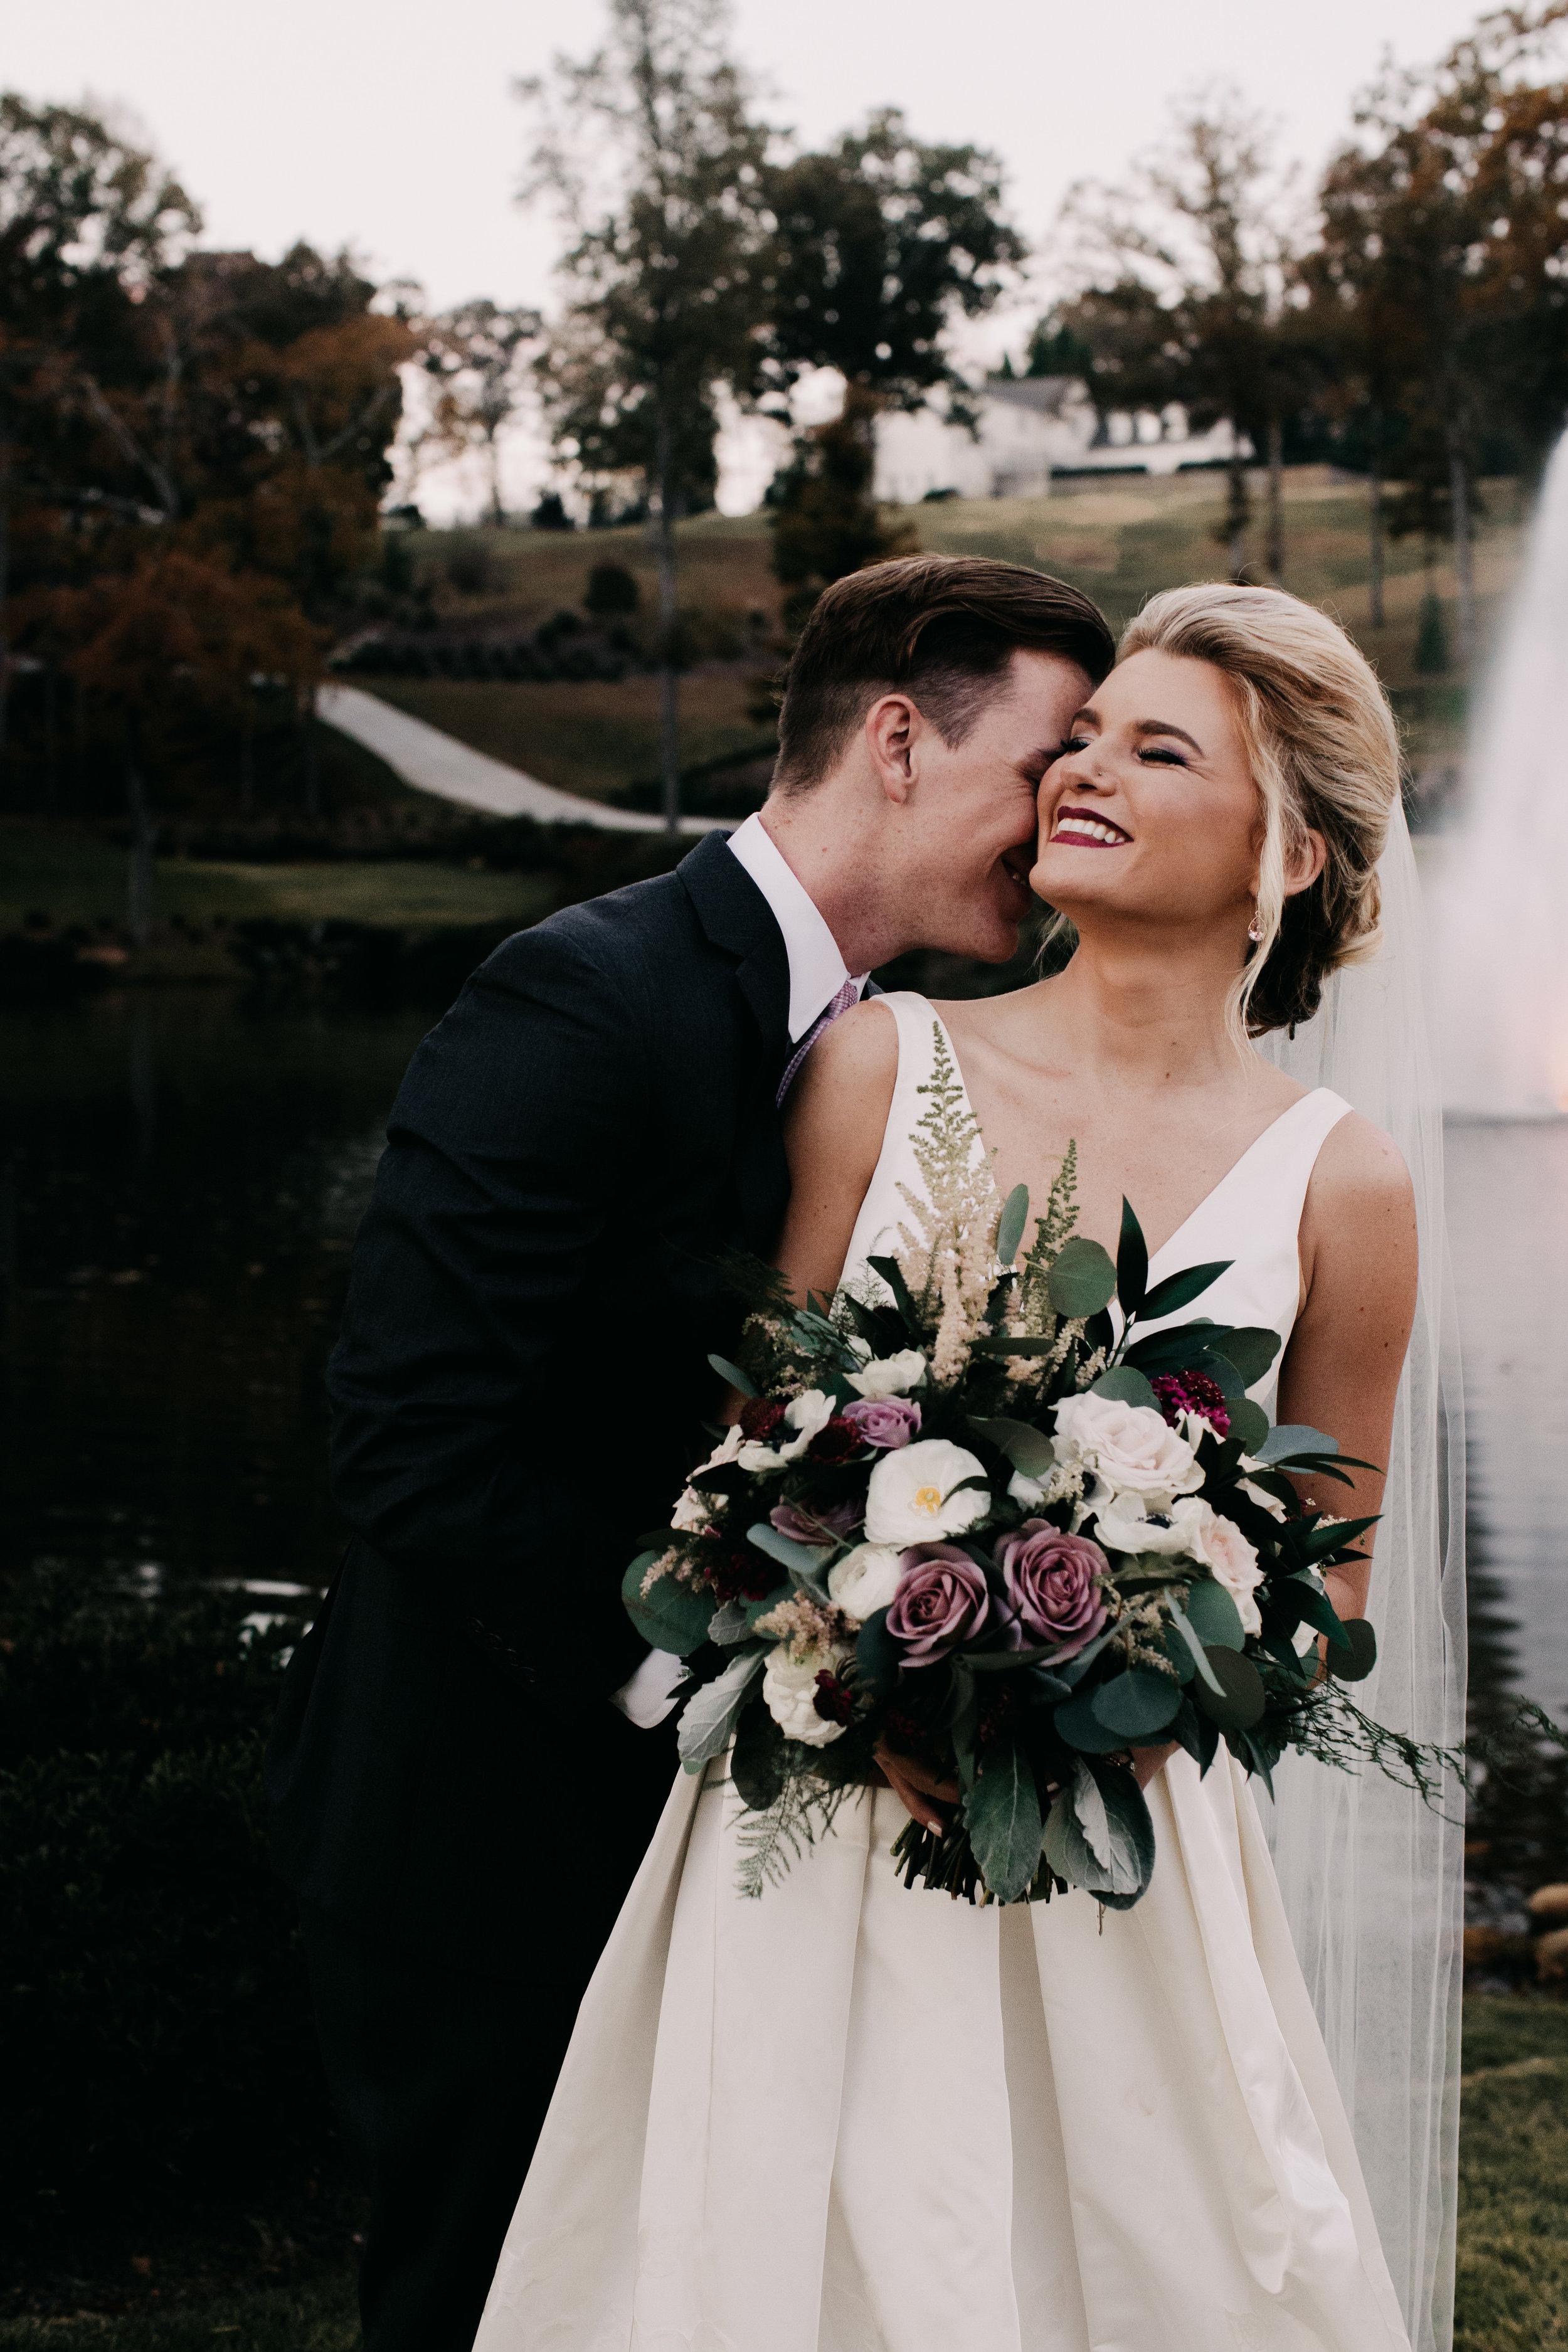 Kaylyn & Ryan Final Wedding Photos433.jpg